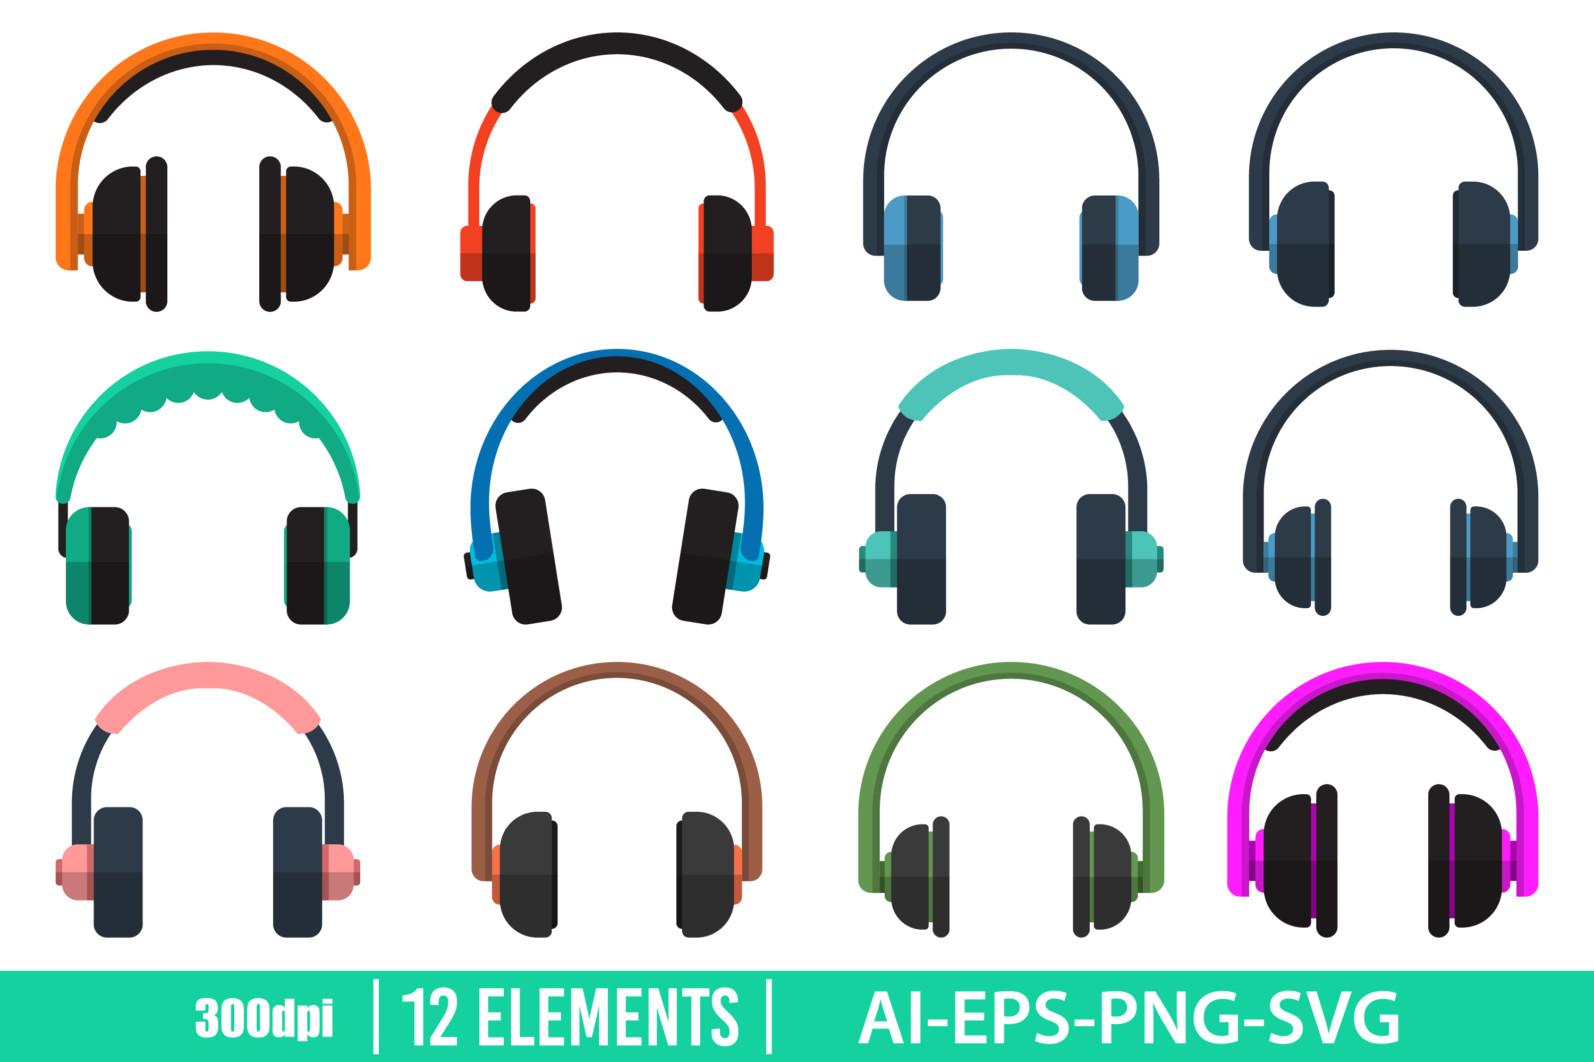 Headphones clipart vector design illustartion. Headphones set. Vector Clipart Print - HEADPHONES scaled -